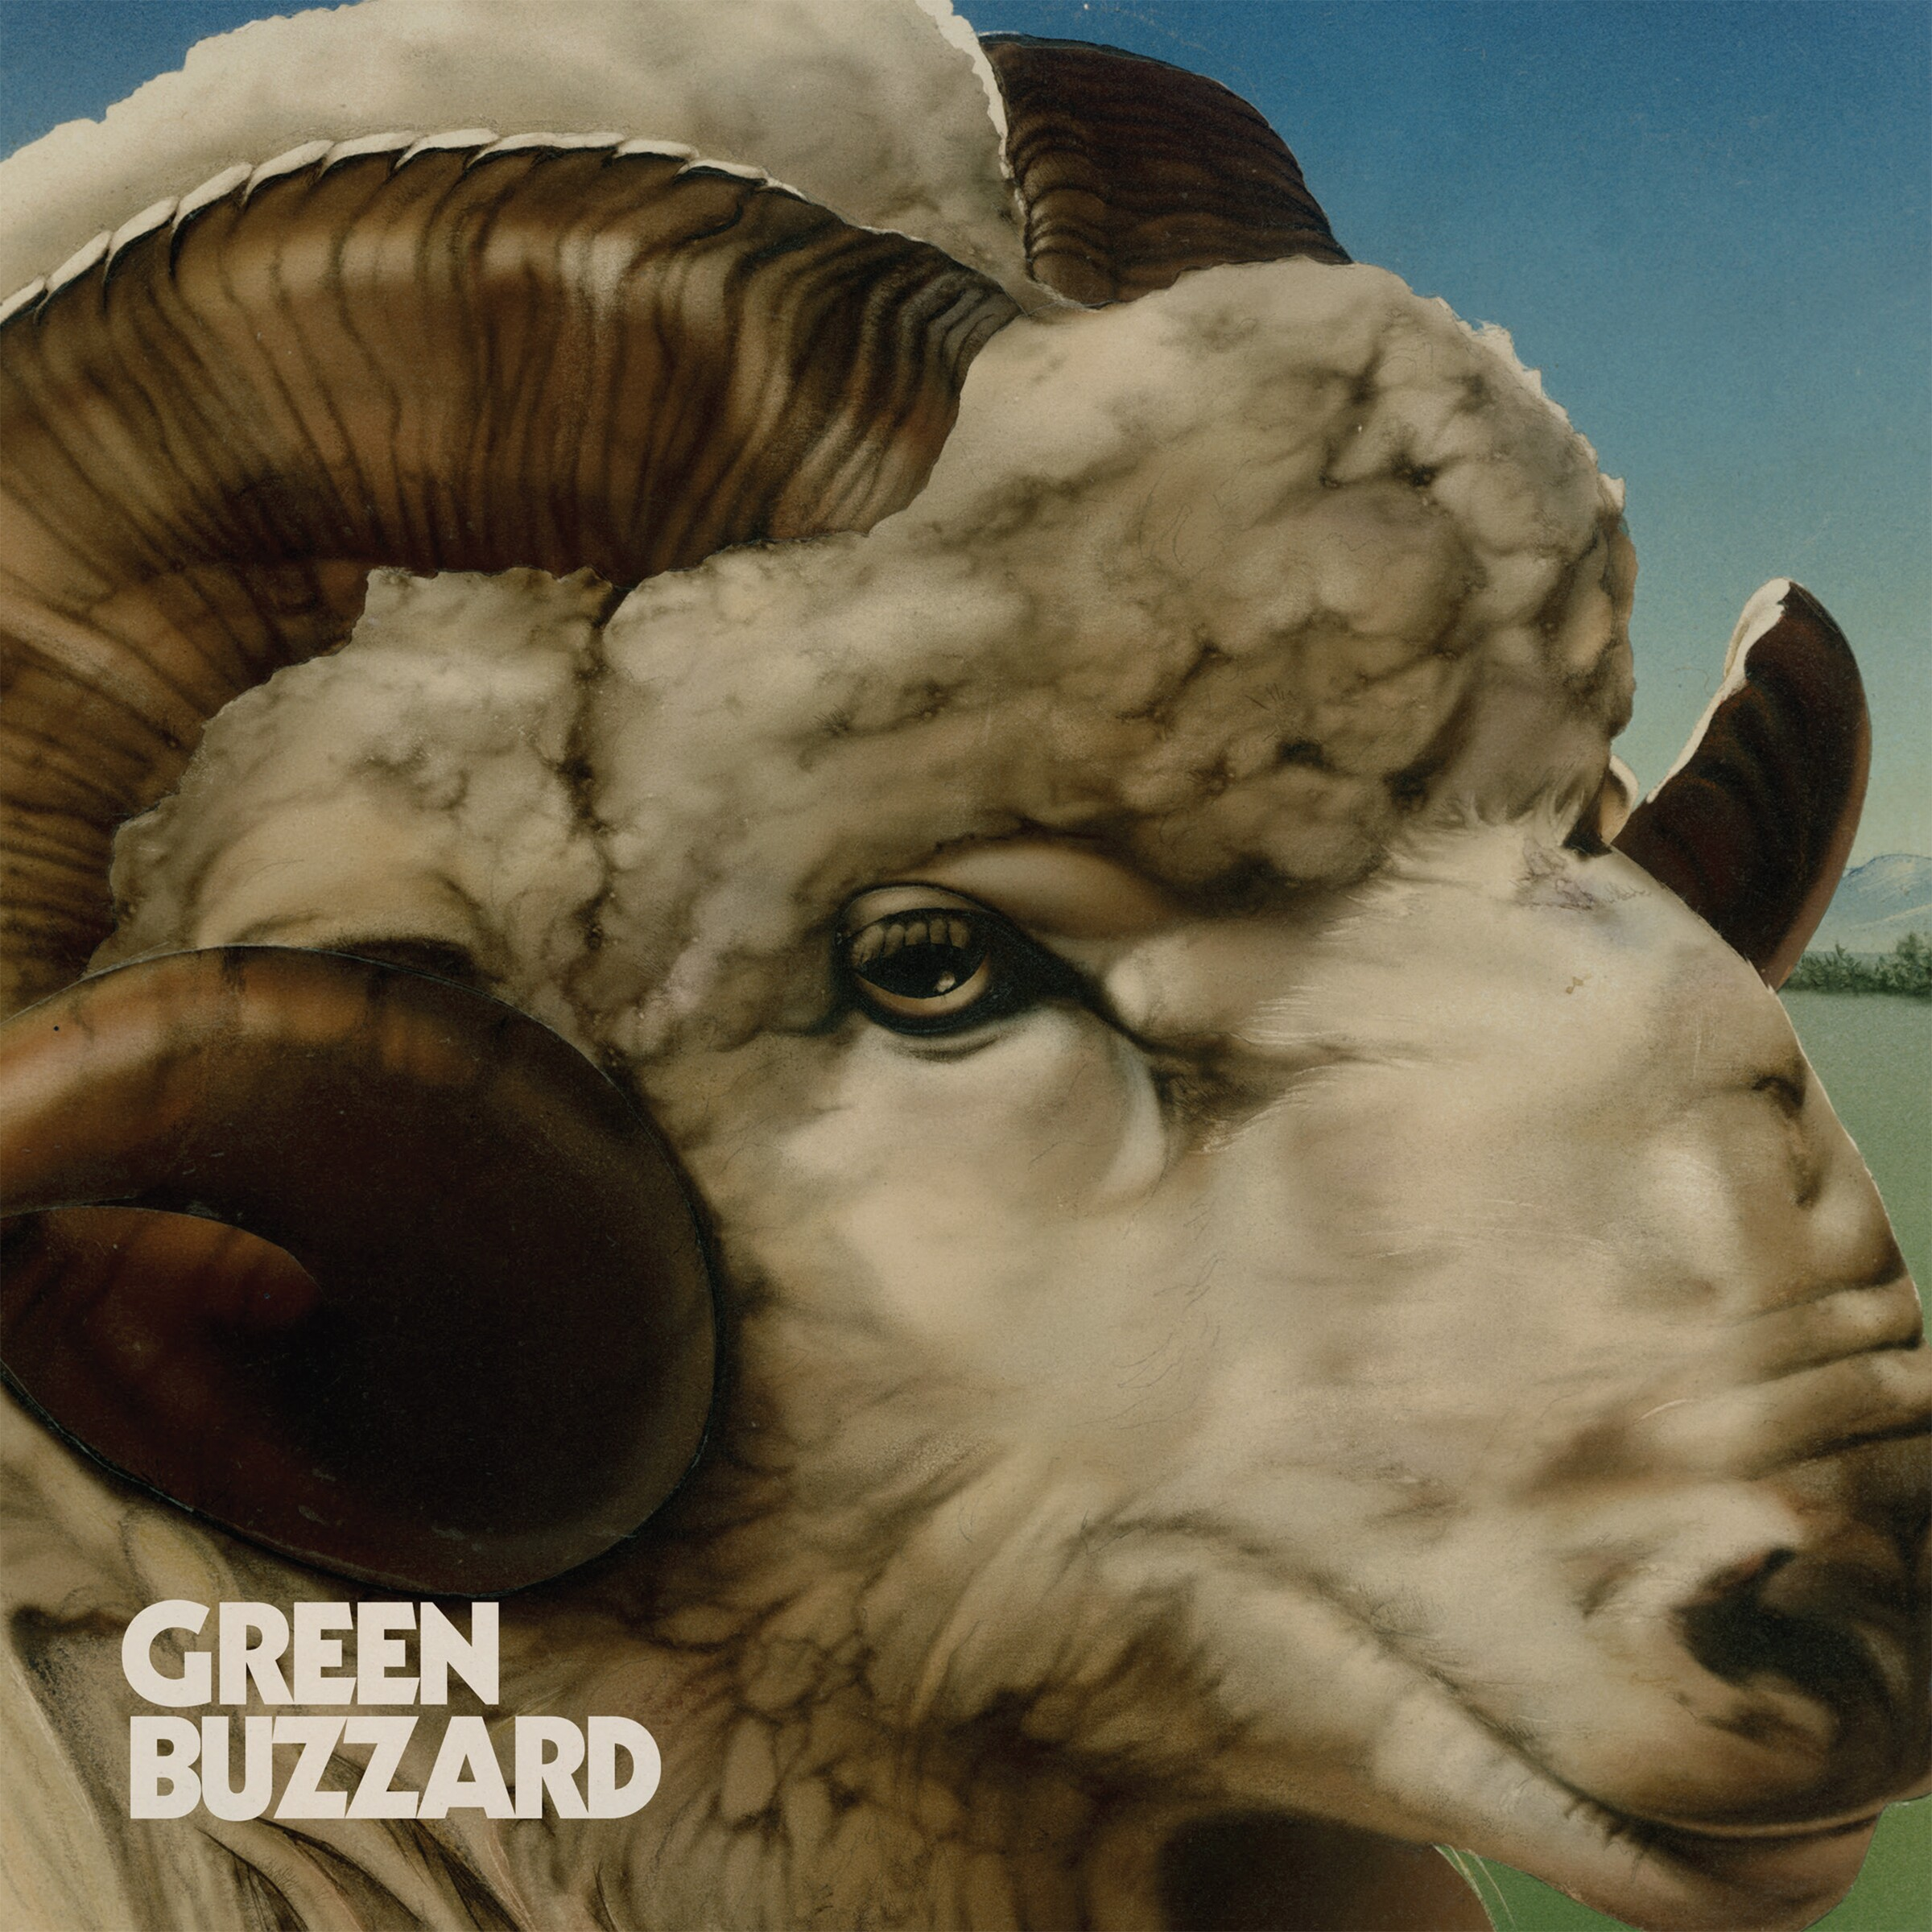 Green Buzzard - Slow It Down Now - Internet Download